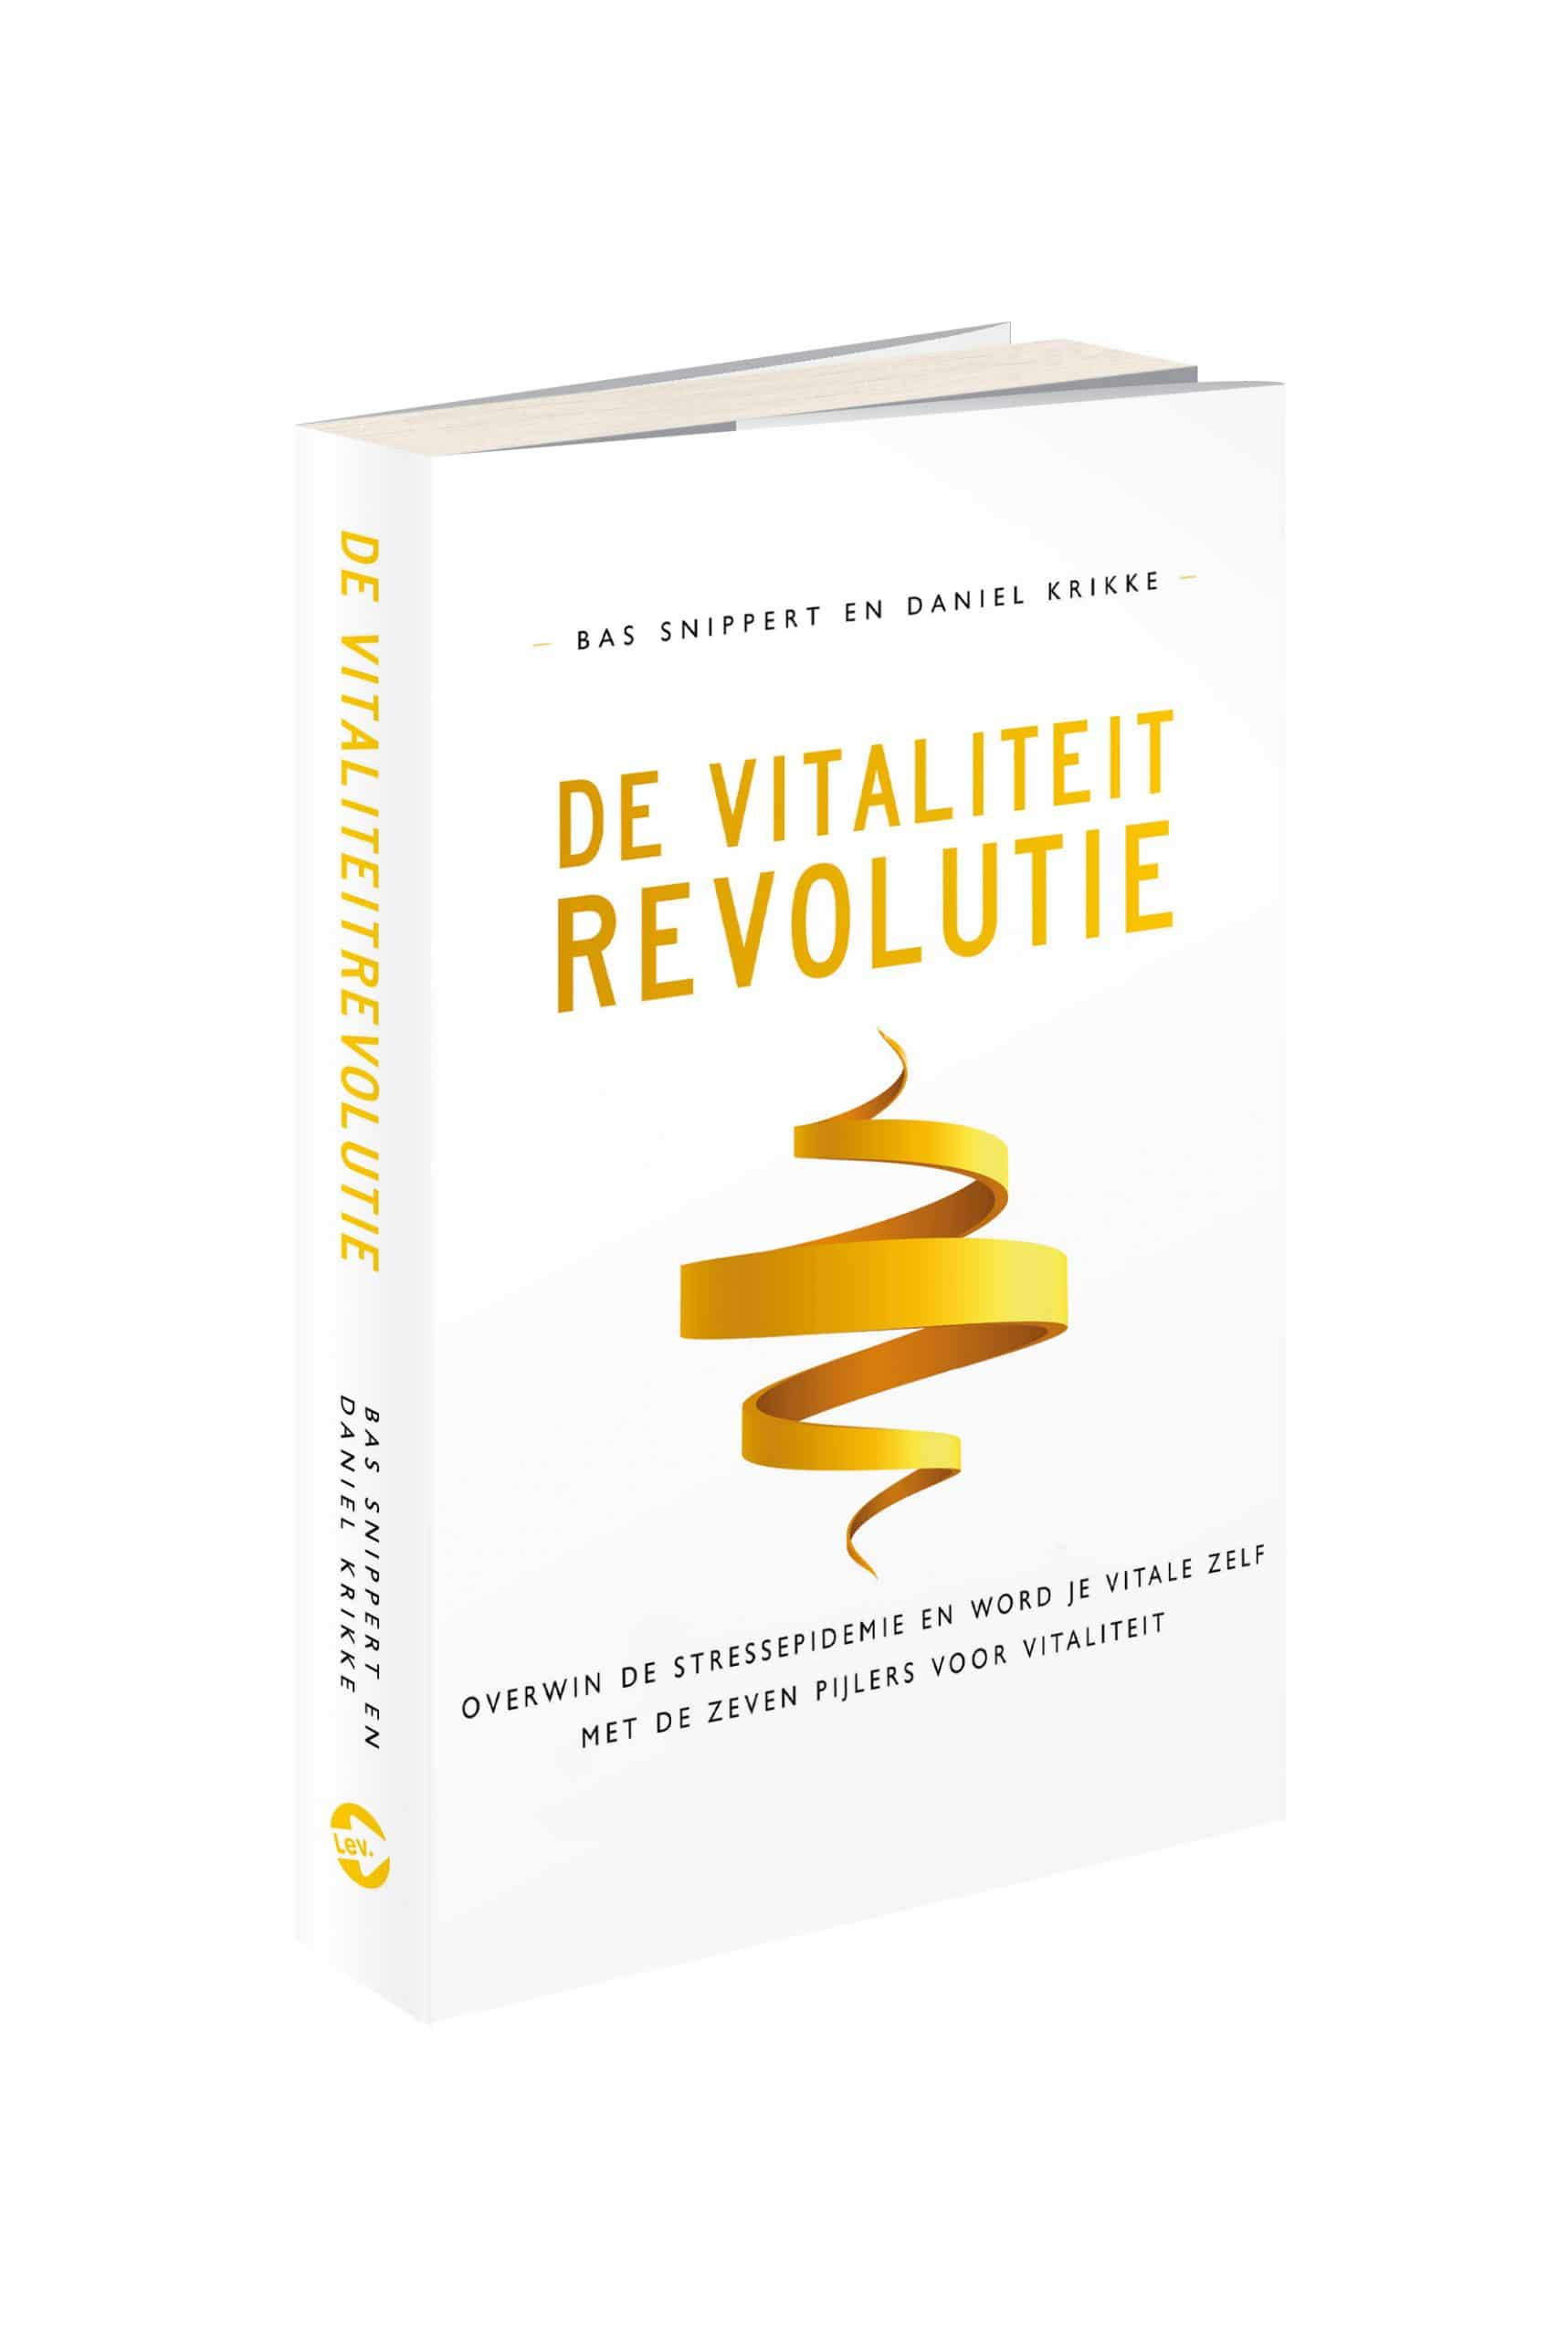 DeVitaliteitrevolutieCover Scaled